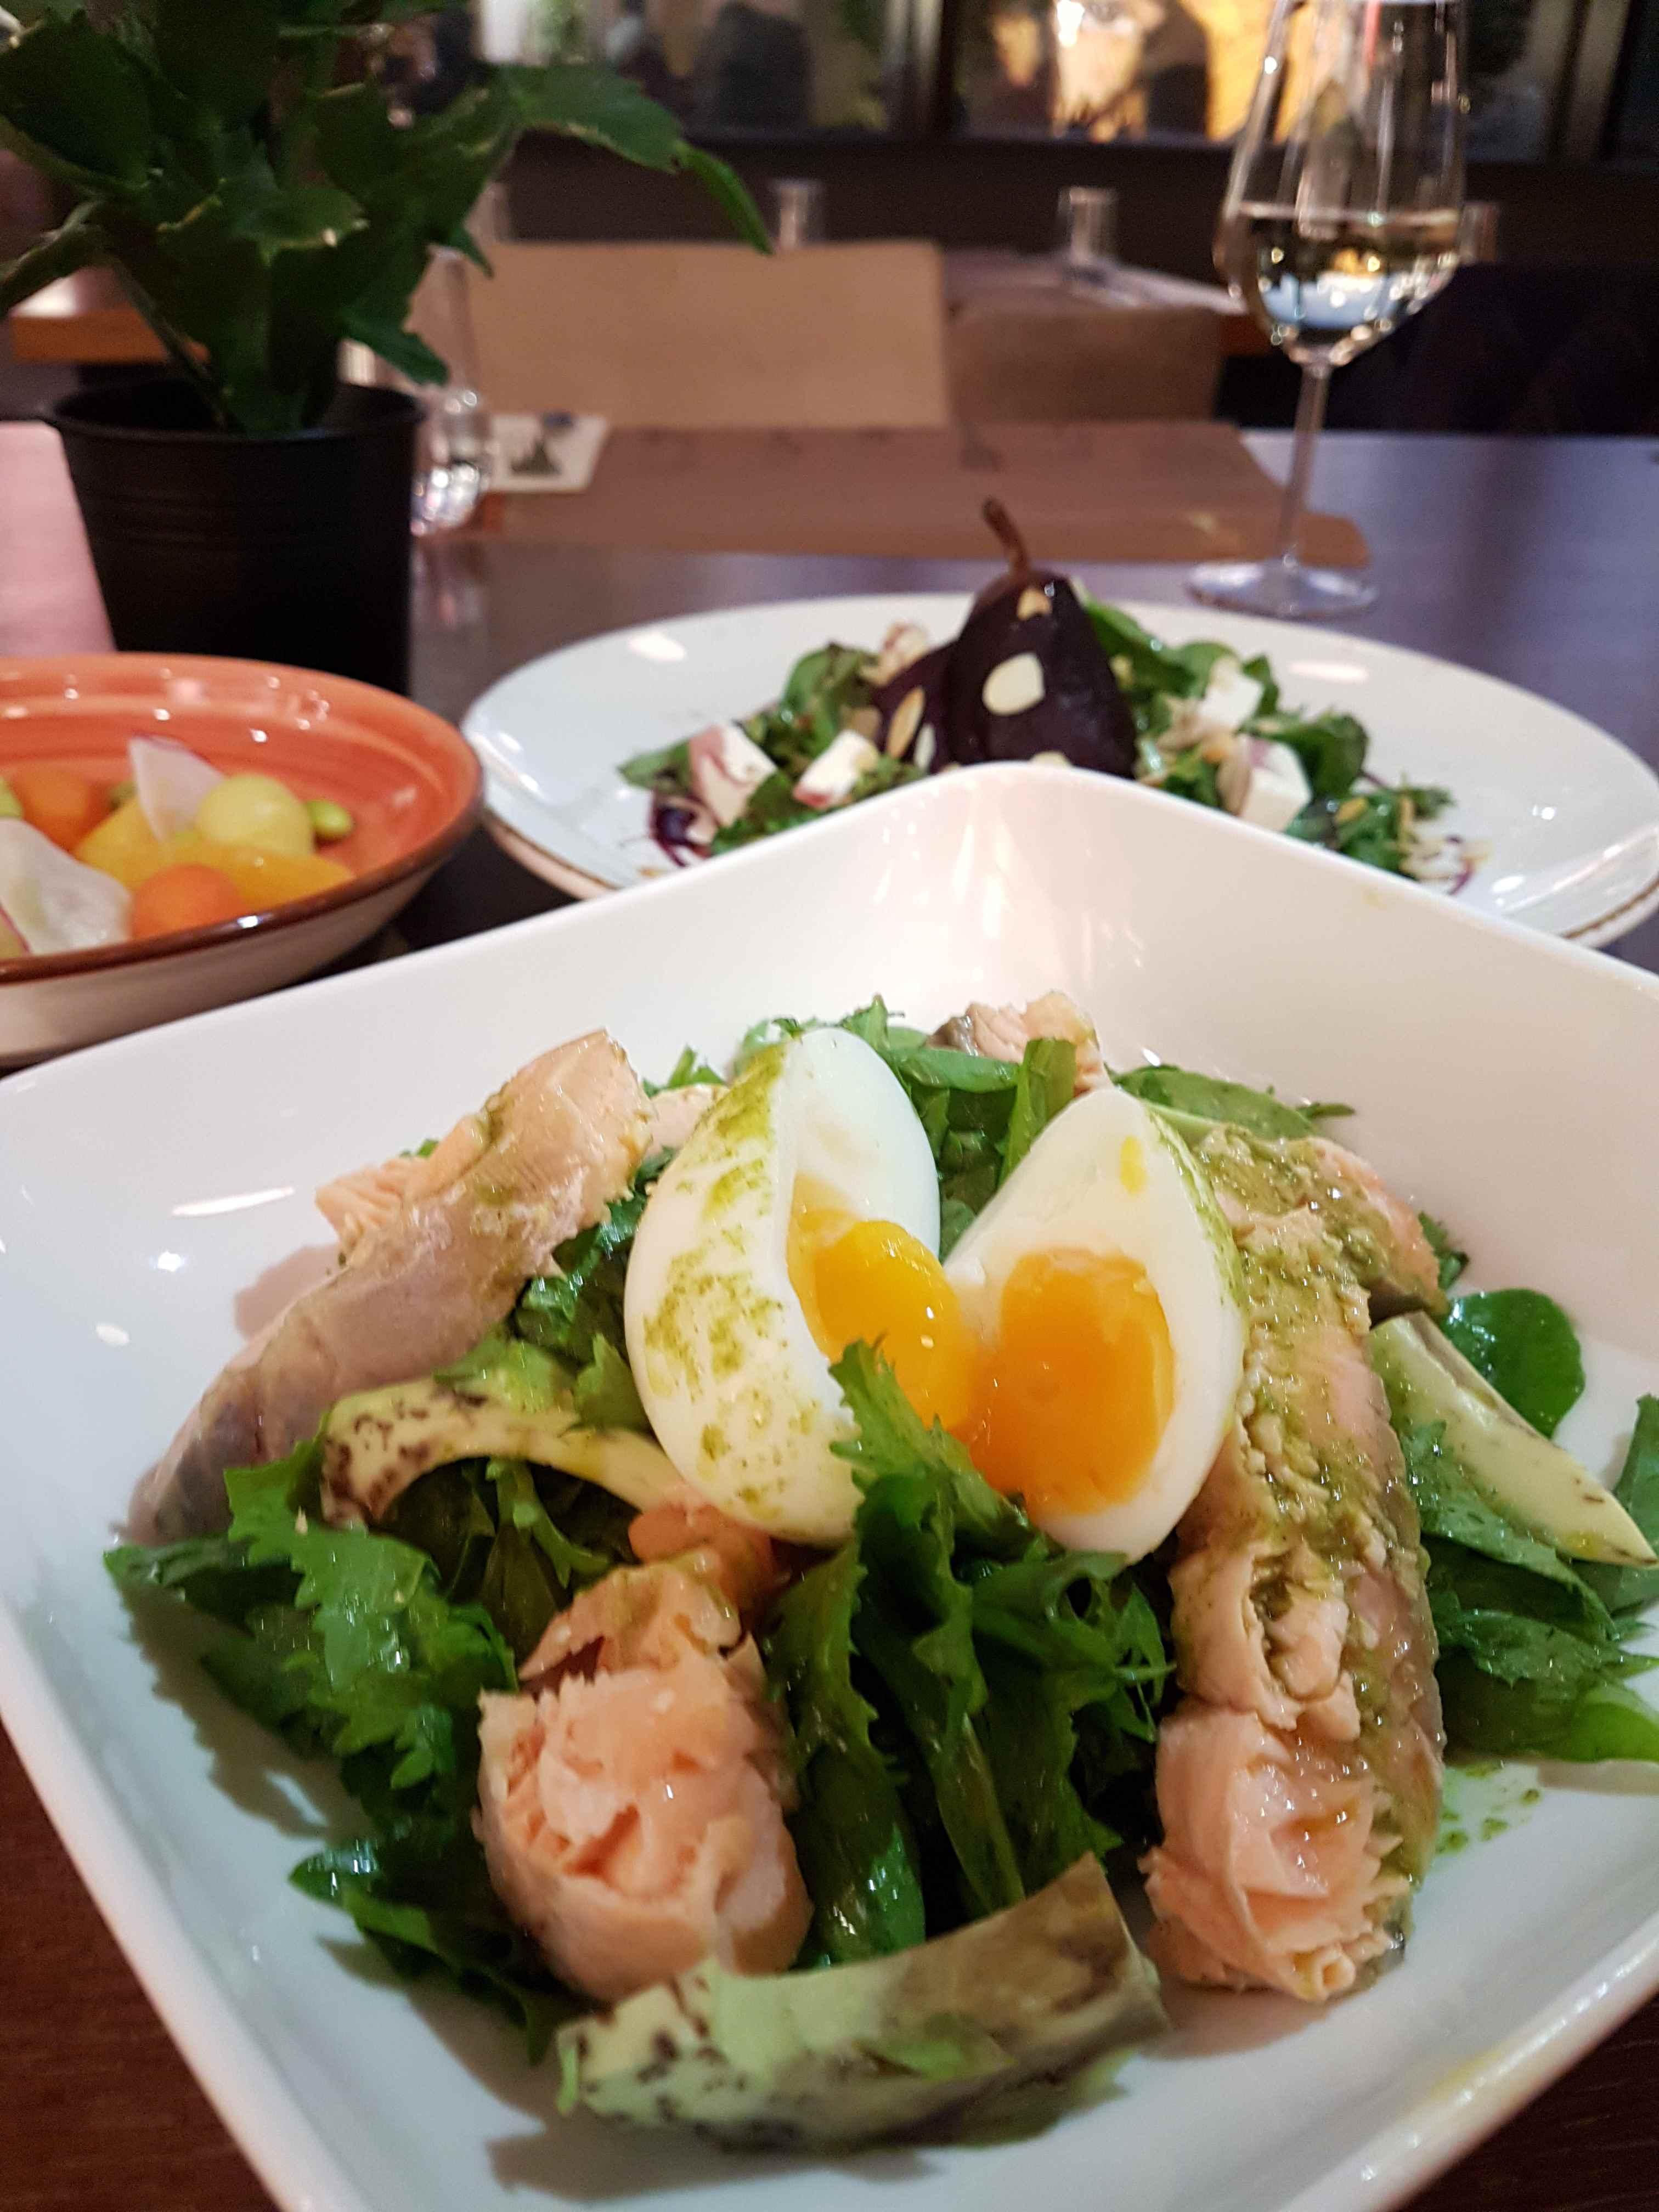 yesempatik-borgo-kitchen-bar-ortakoy-ulus-yemek-pose-yumurta-somon